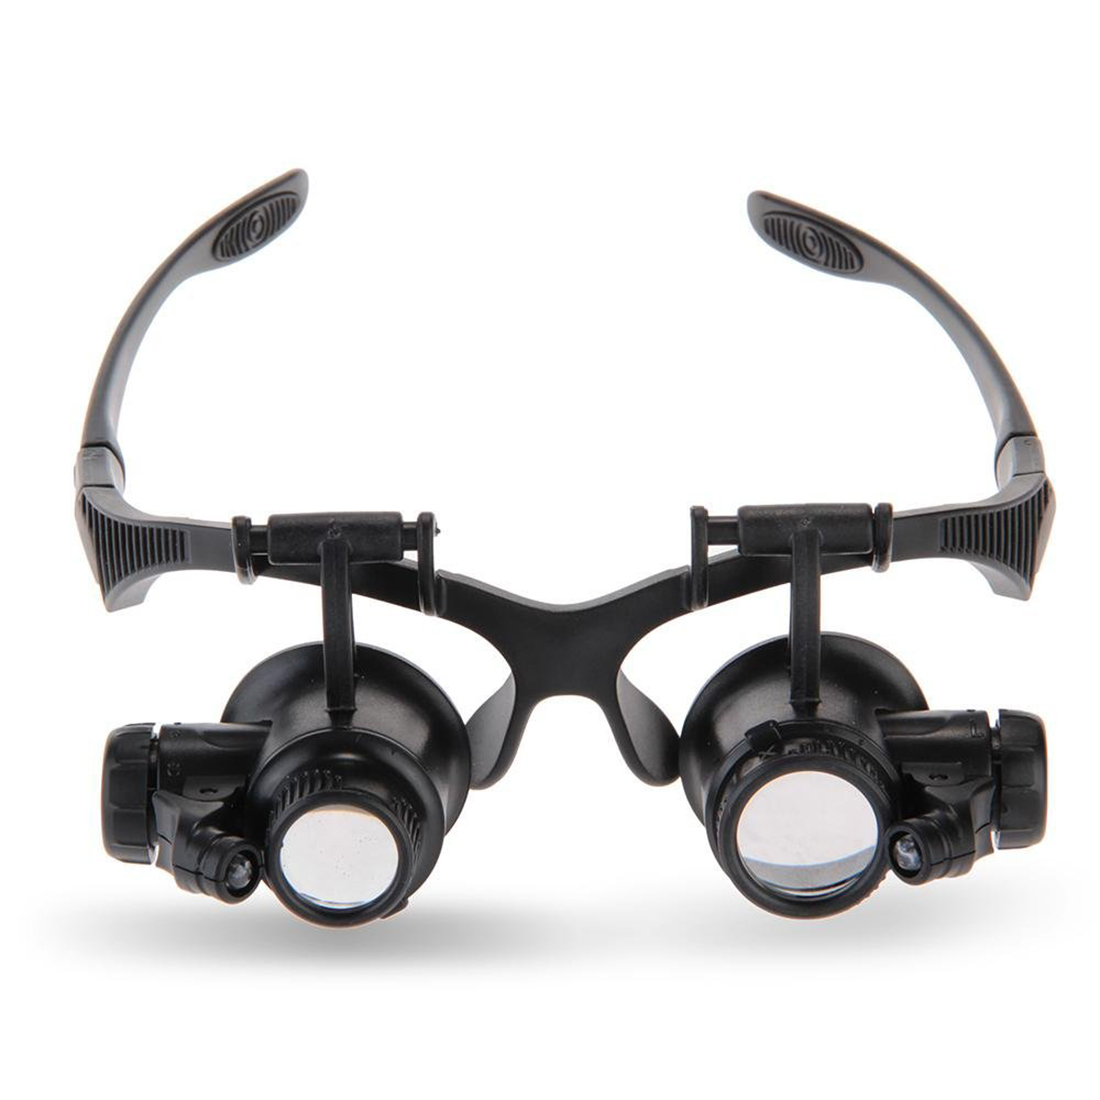 Cabeça LEVOU Luz Óculos Lupa 10X 15X 20X 25X Relojoeiro Jóias Lupa Lupa Lente de Vidro Óptico